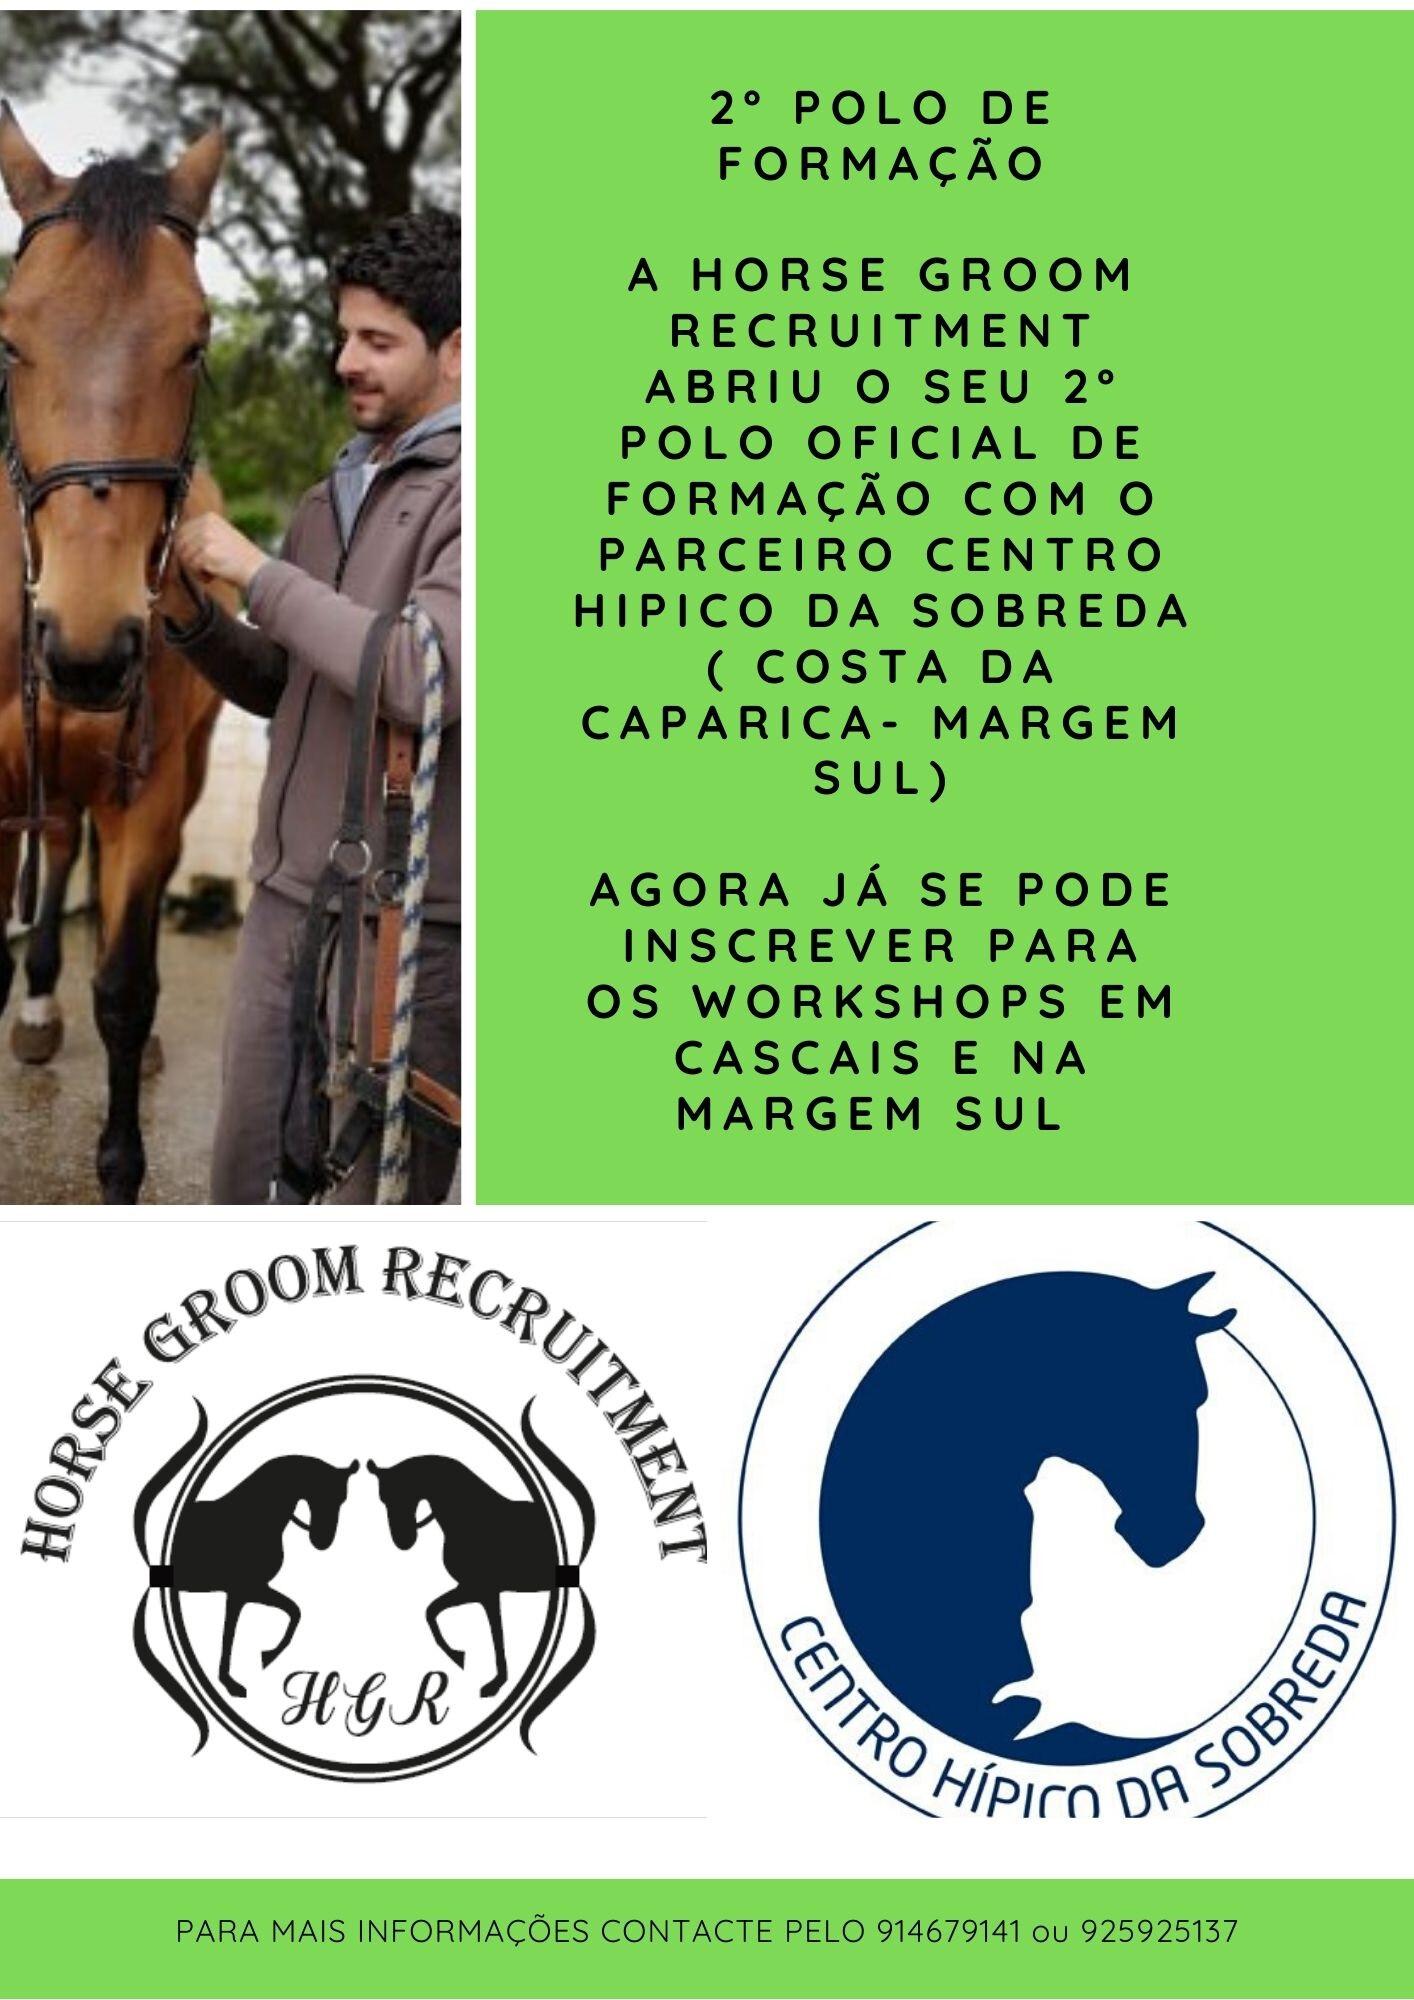 Horse Groom Recruitment